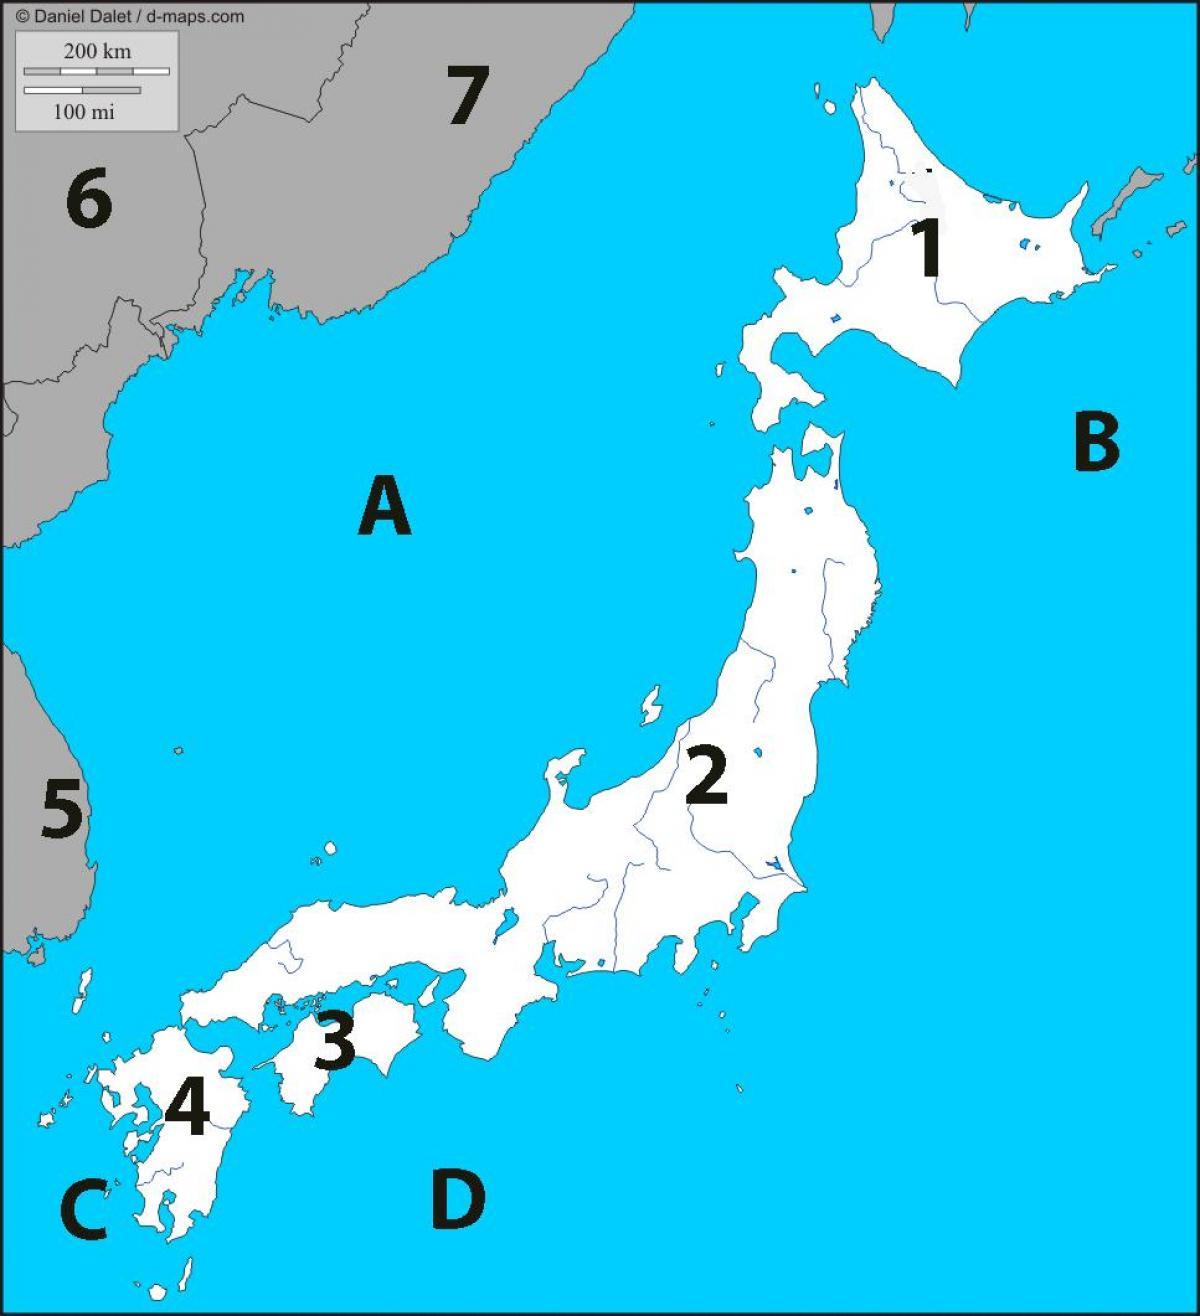 asia kart quiz Japan kart quiz   Kart over japan quiz (Øst Asia   Asia) asia kart quiz